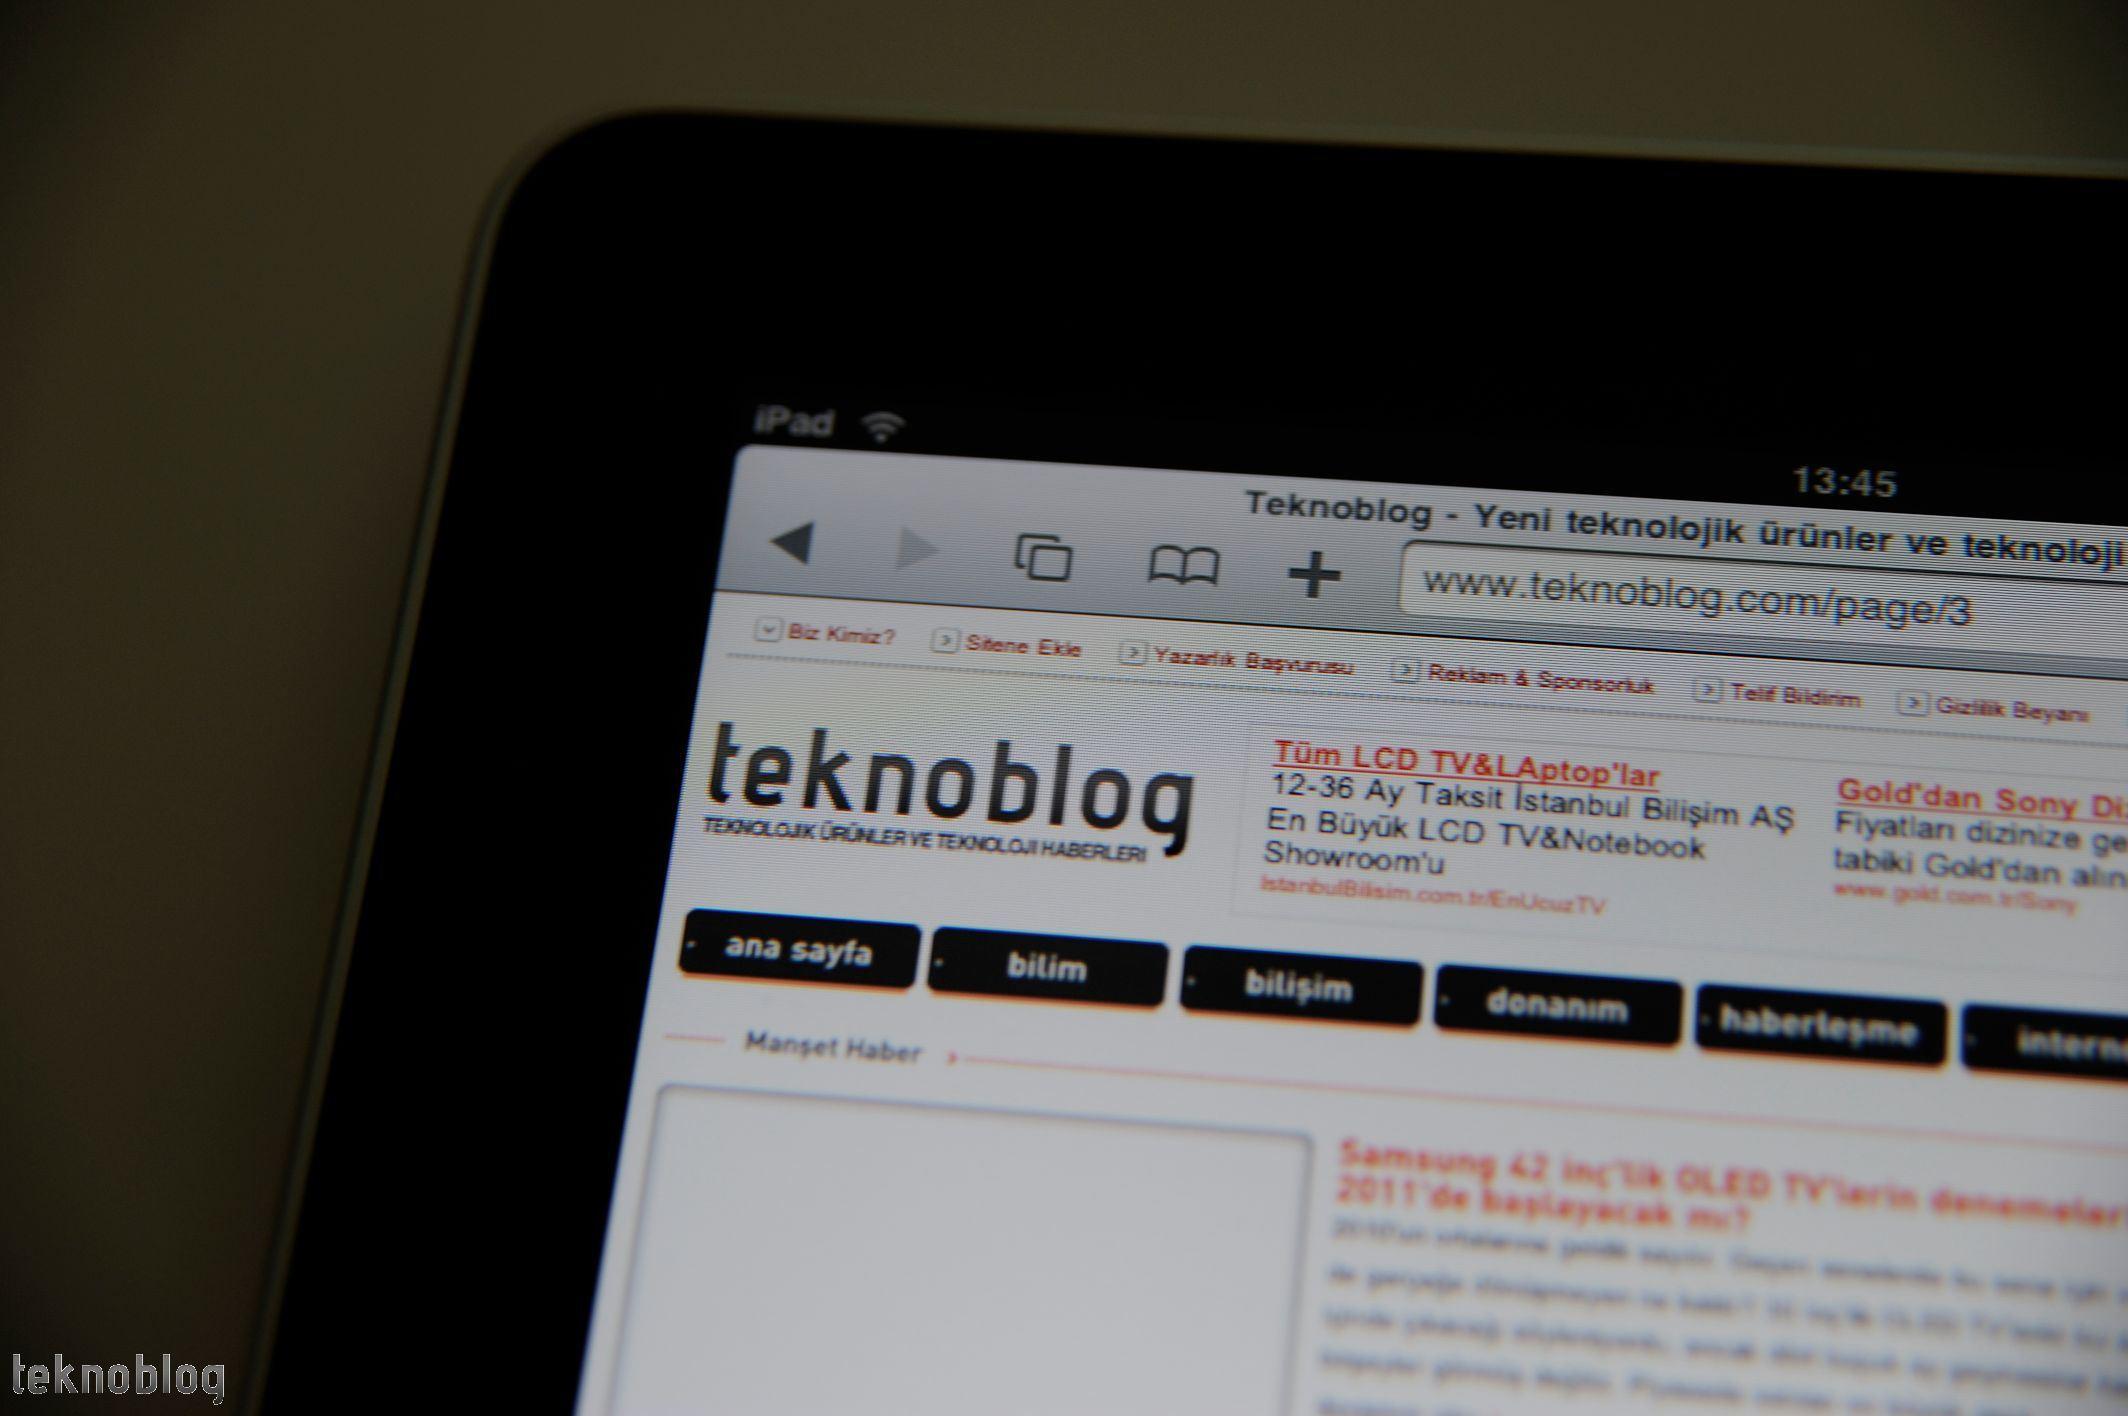 Teknoblog İncelemesi: Apple iPad – Galeri